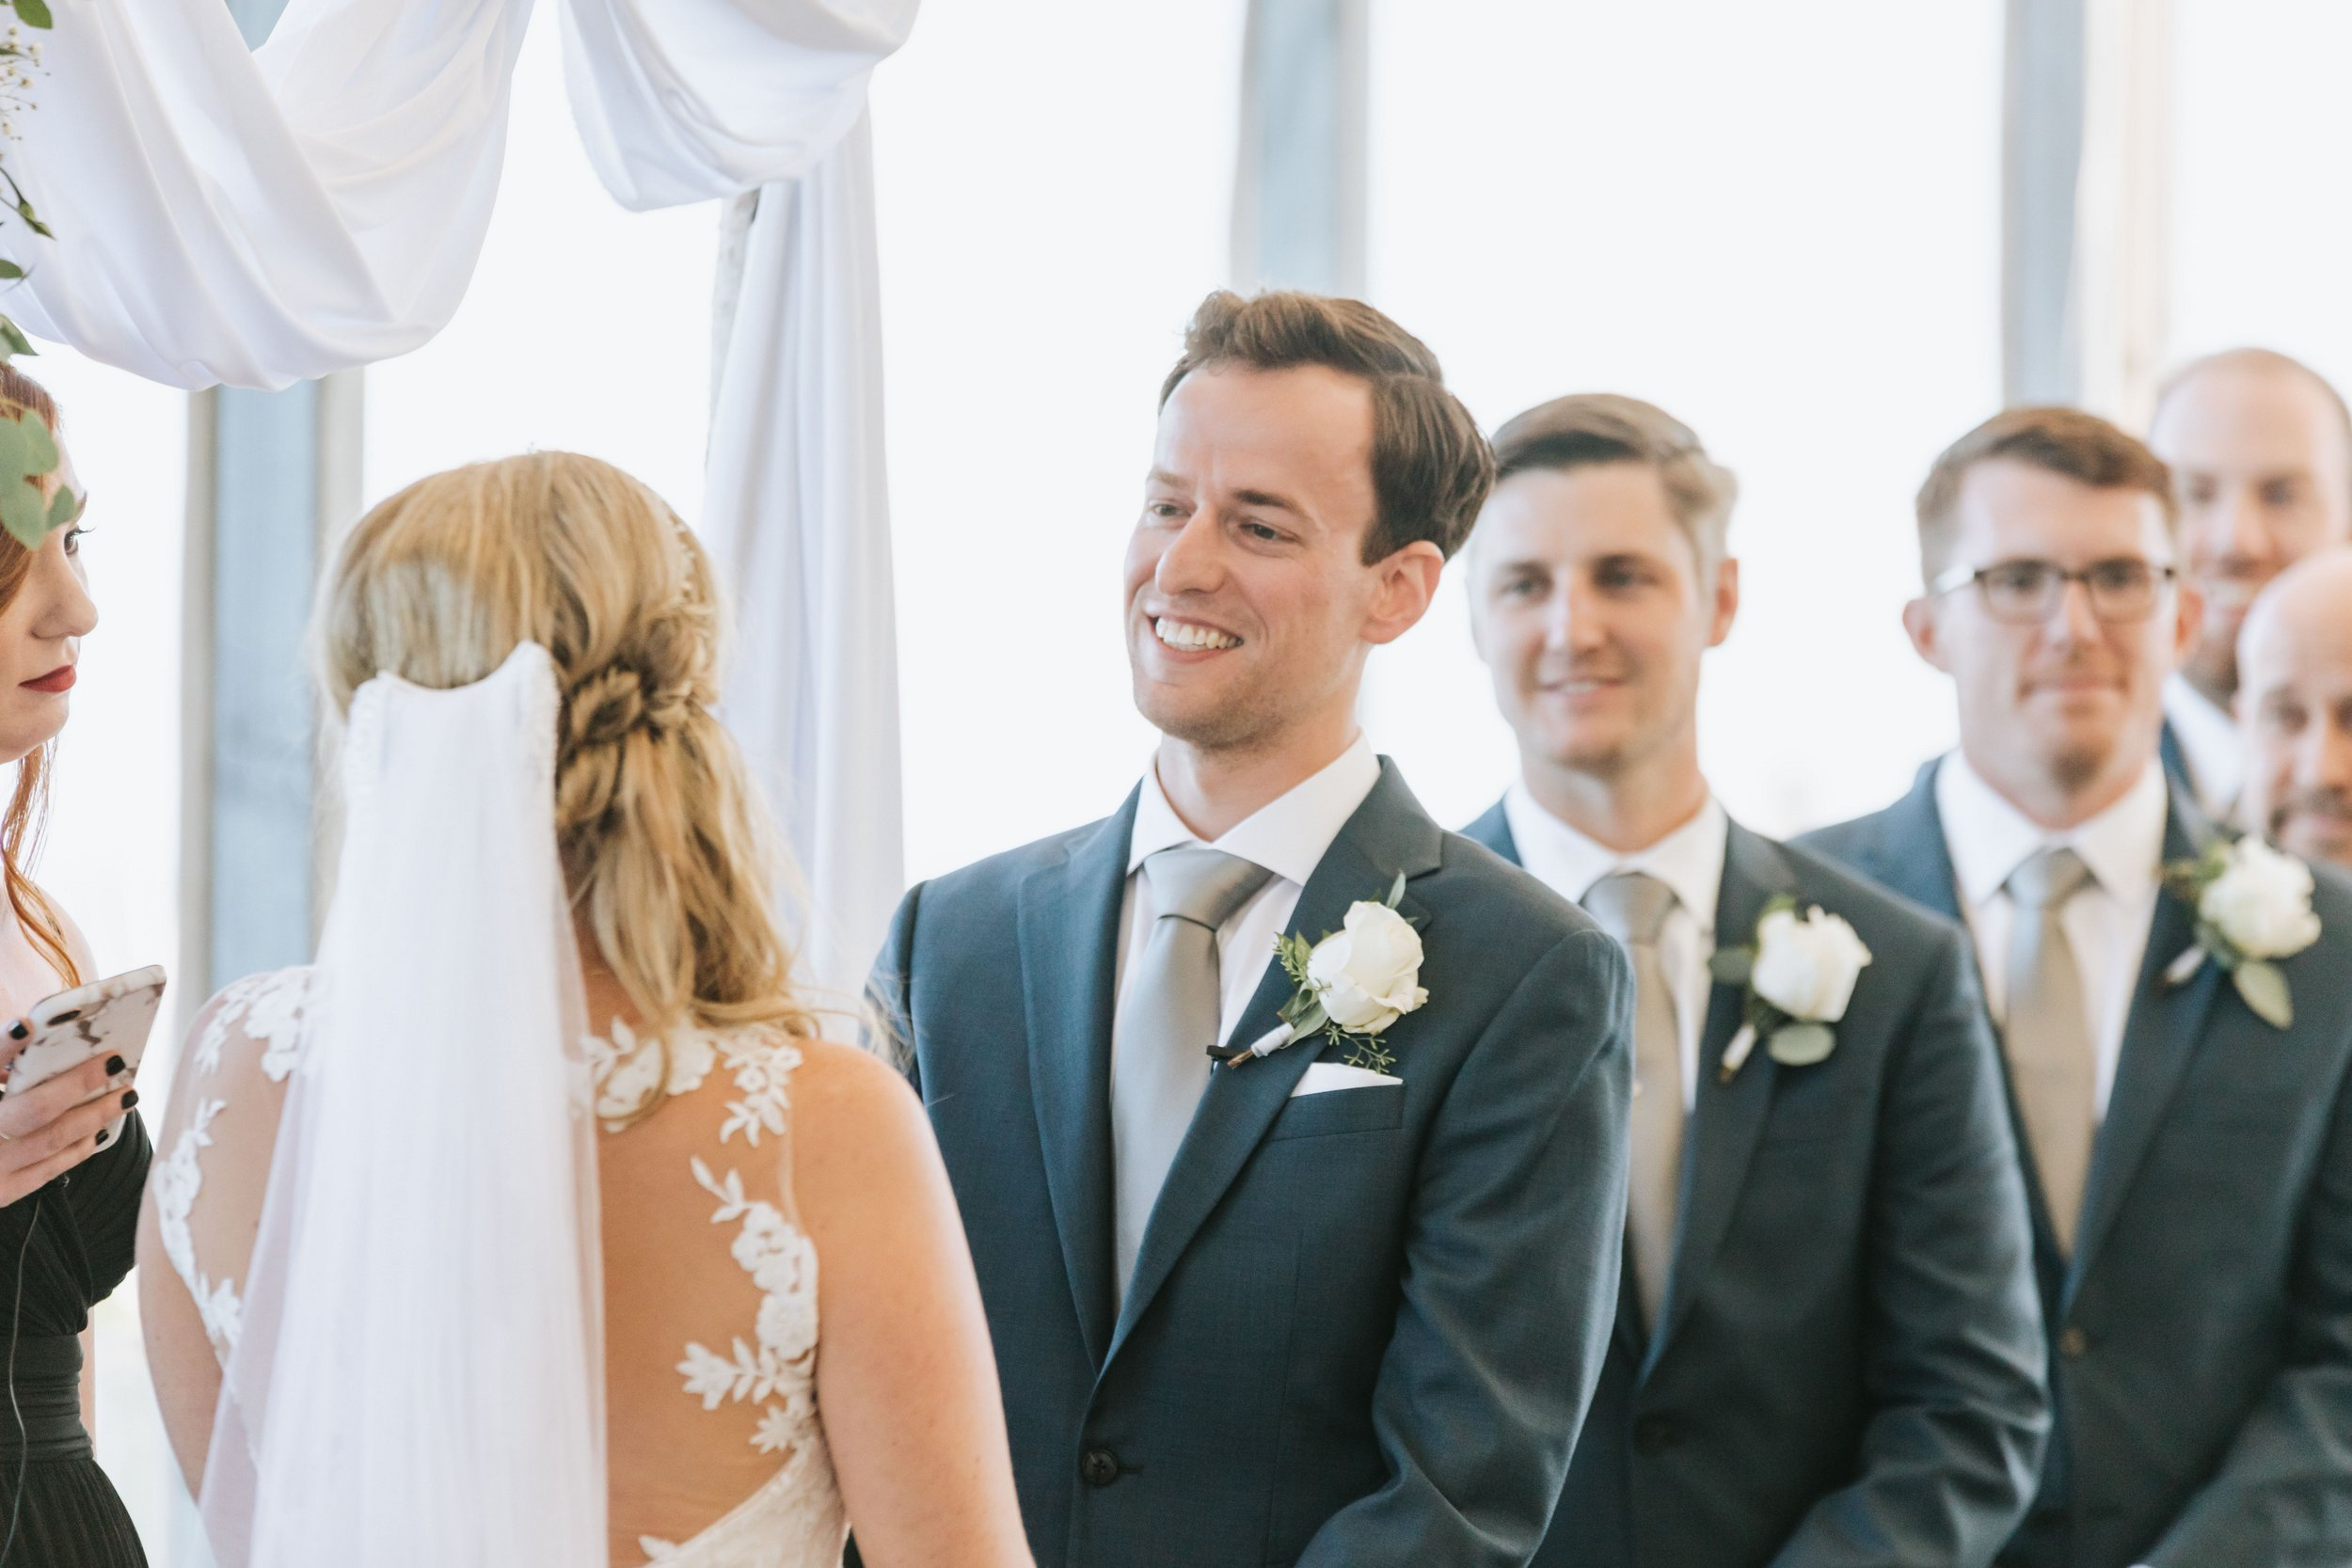 Popponesset-Inn-Wedding-Cape-Cod-Lena-Mirisola-Photography-35.jpg